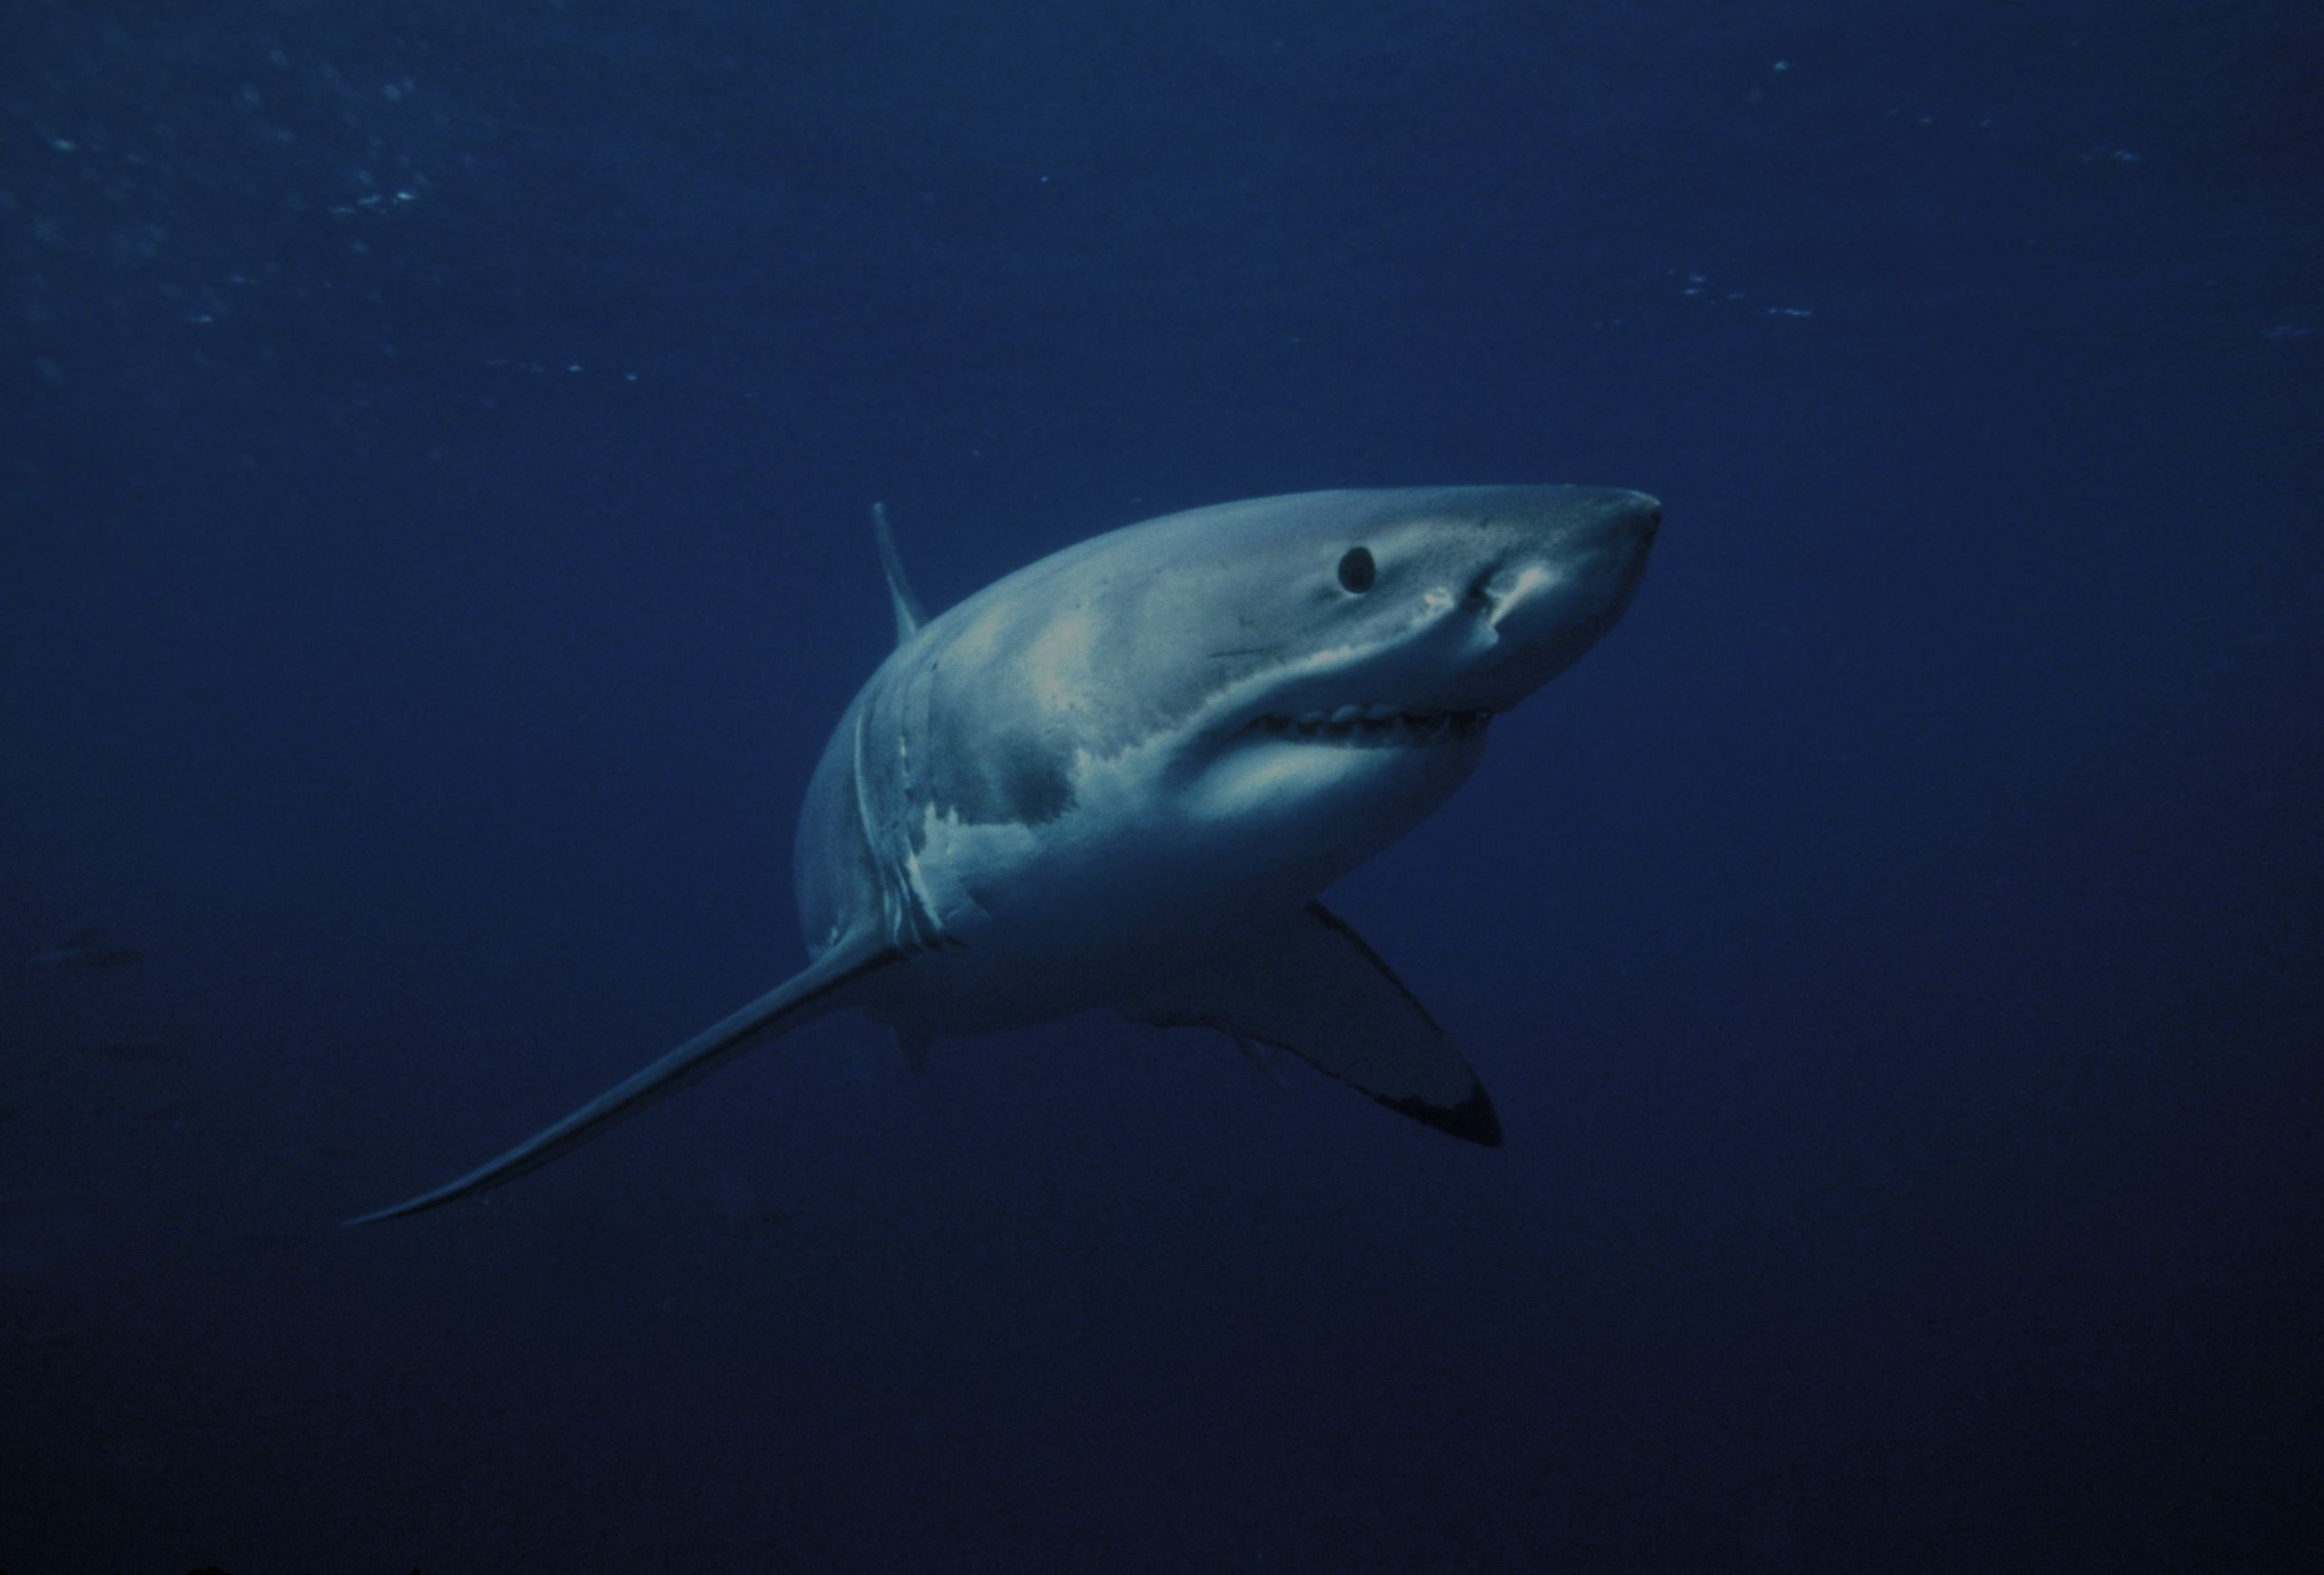 Great White Shark siting off shore of Jupiter